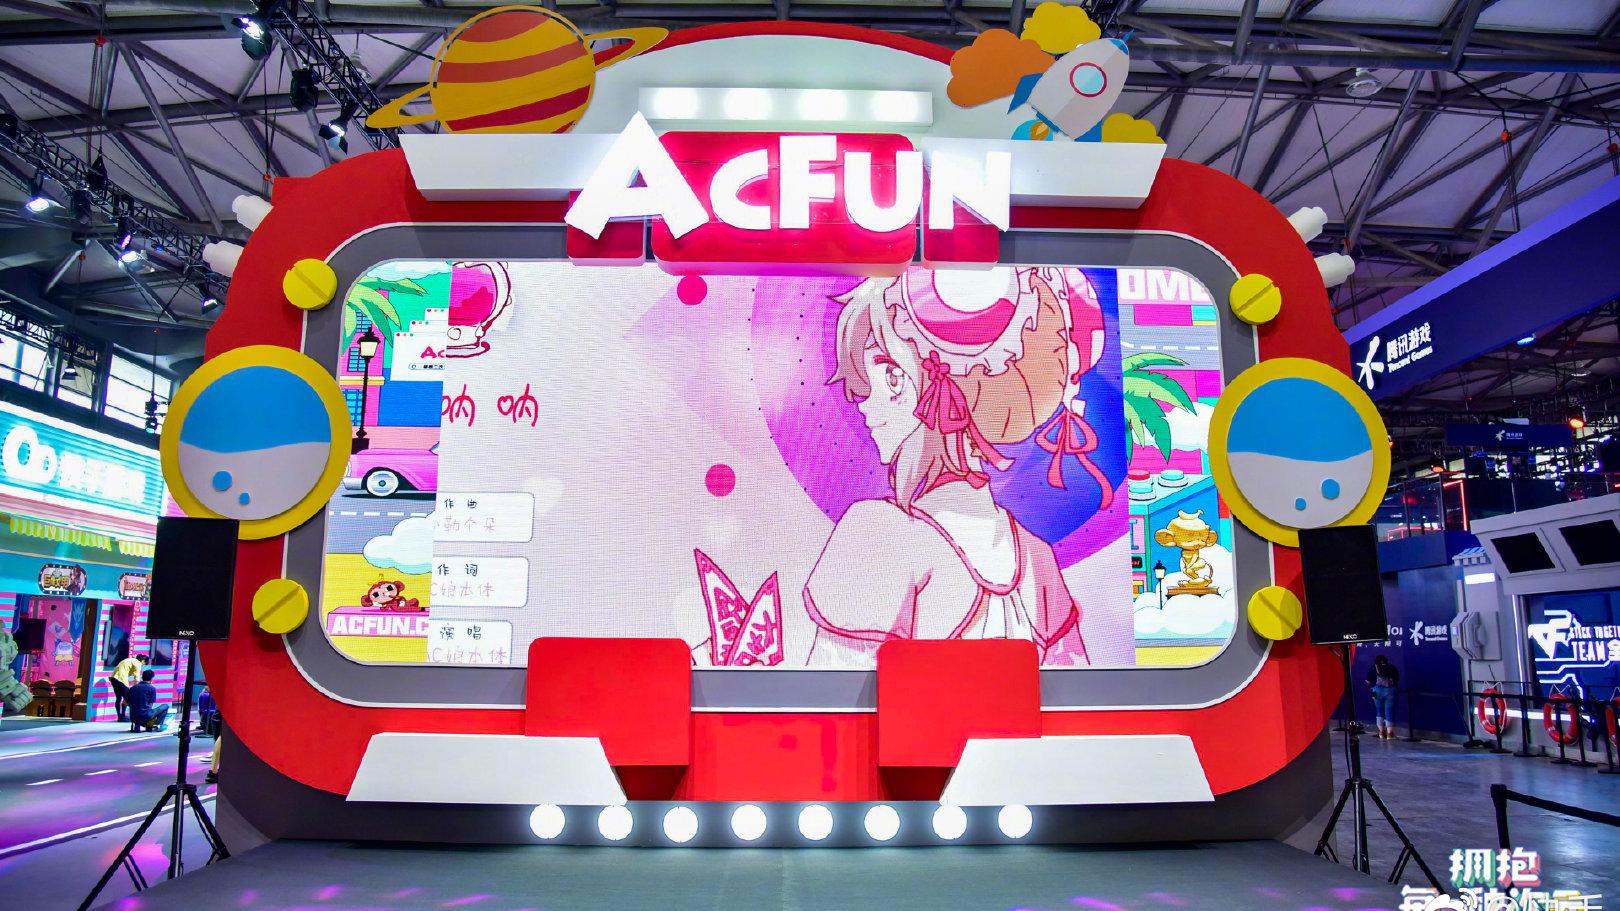 【CJ ACFUN现场】8月2日A站舞台 凳猫 汉堡王 可心喵演出部分录屏